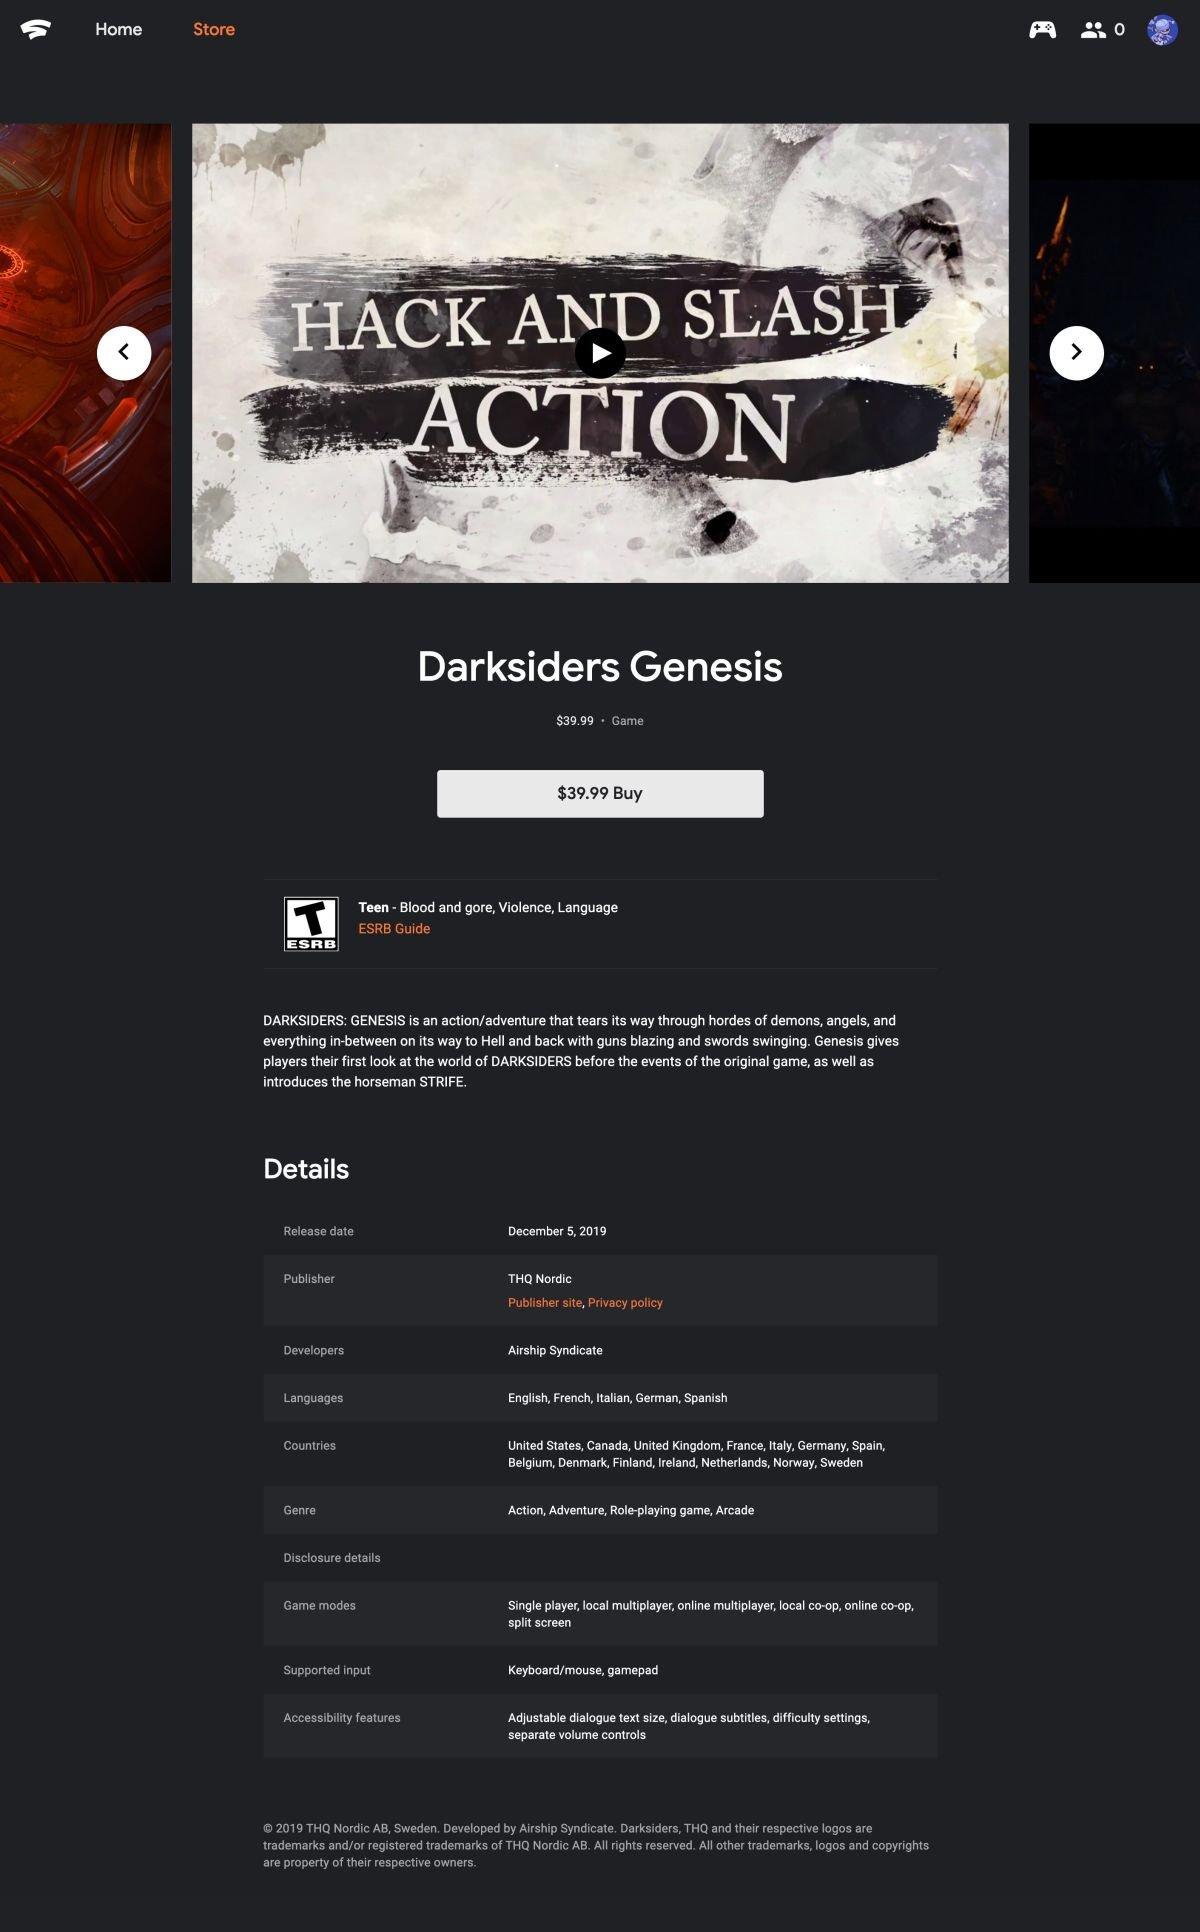 stadia web store detail screenshot